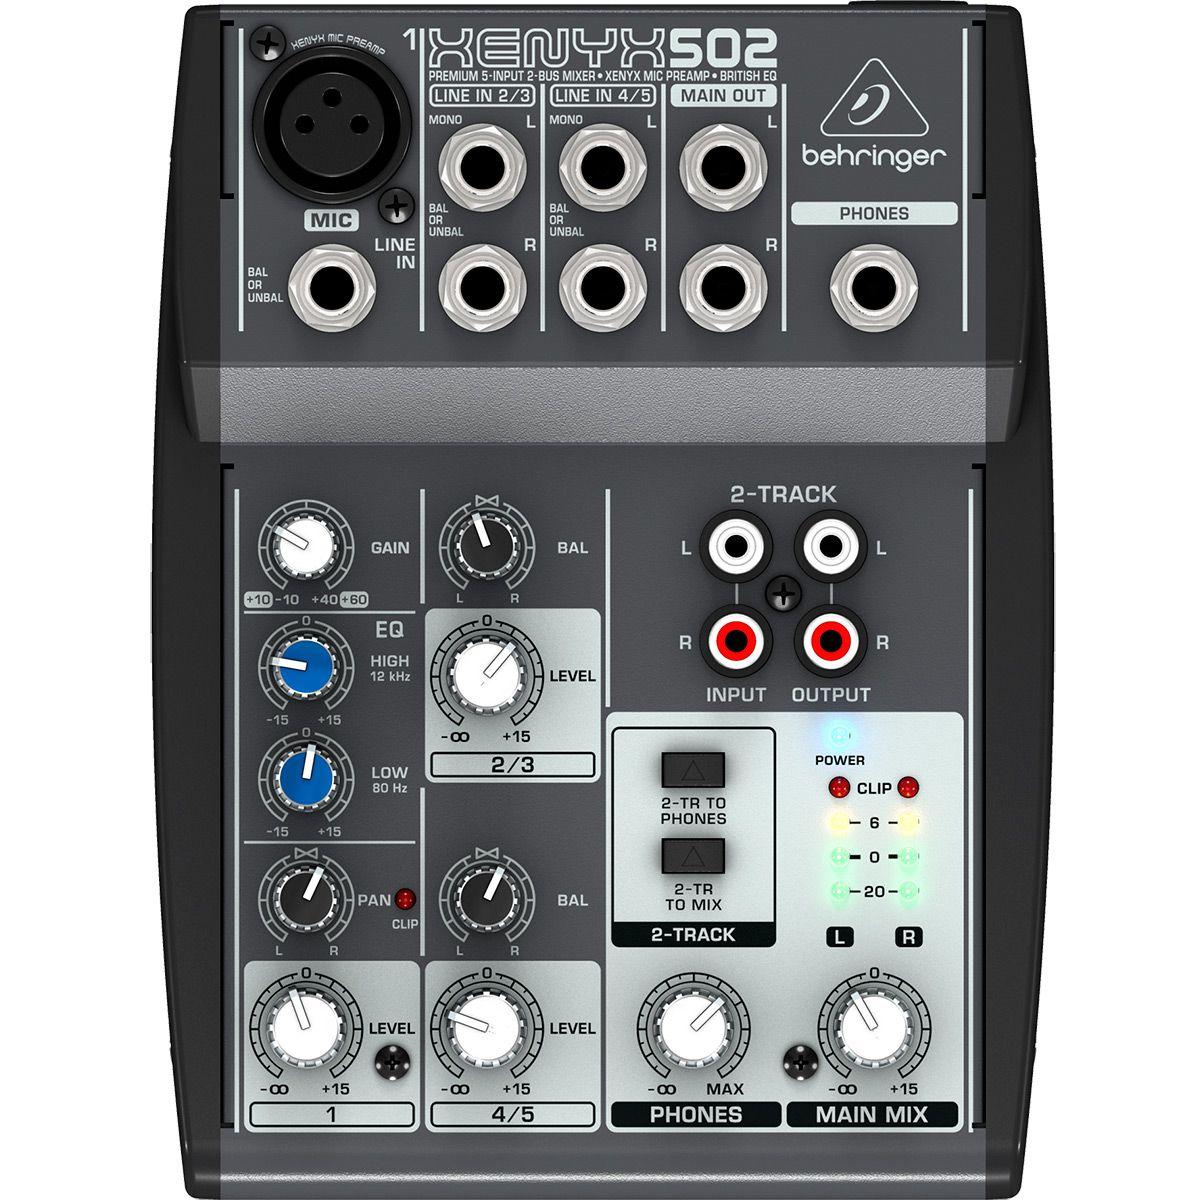 Kit de Áudio Interface Behringer PODCASTUDIO USB